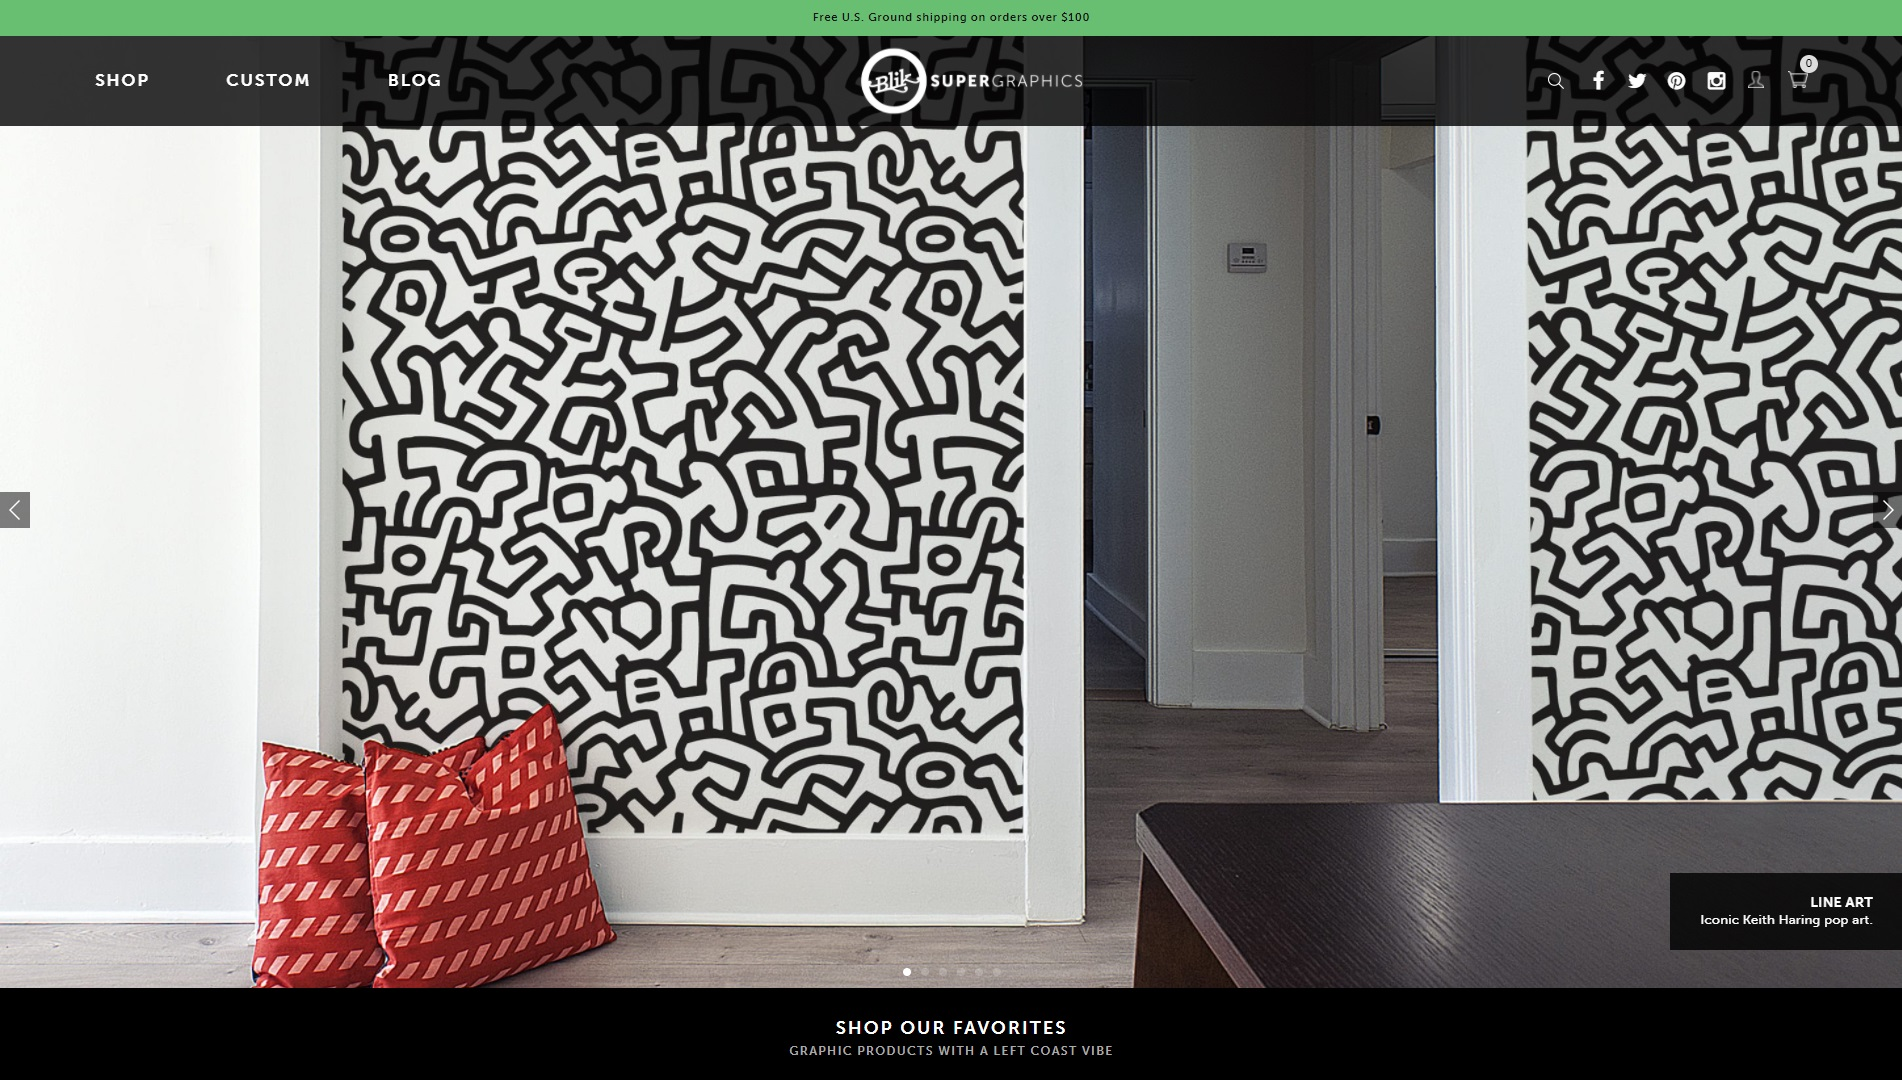 Mooie webshop Blik supergraphics